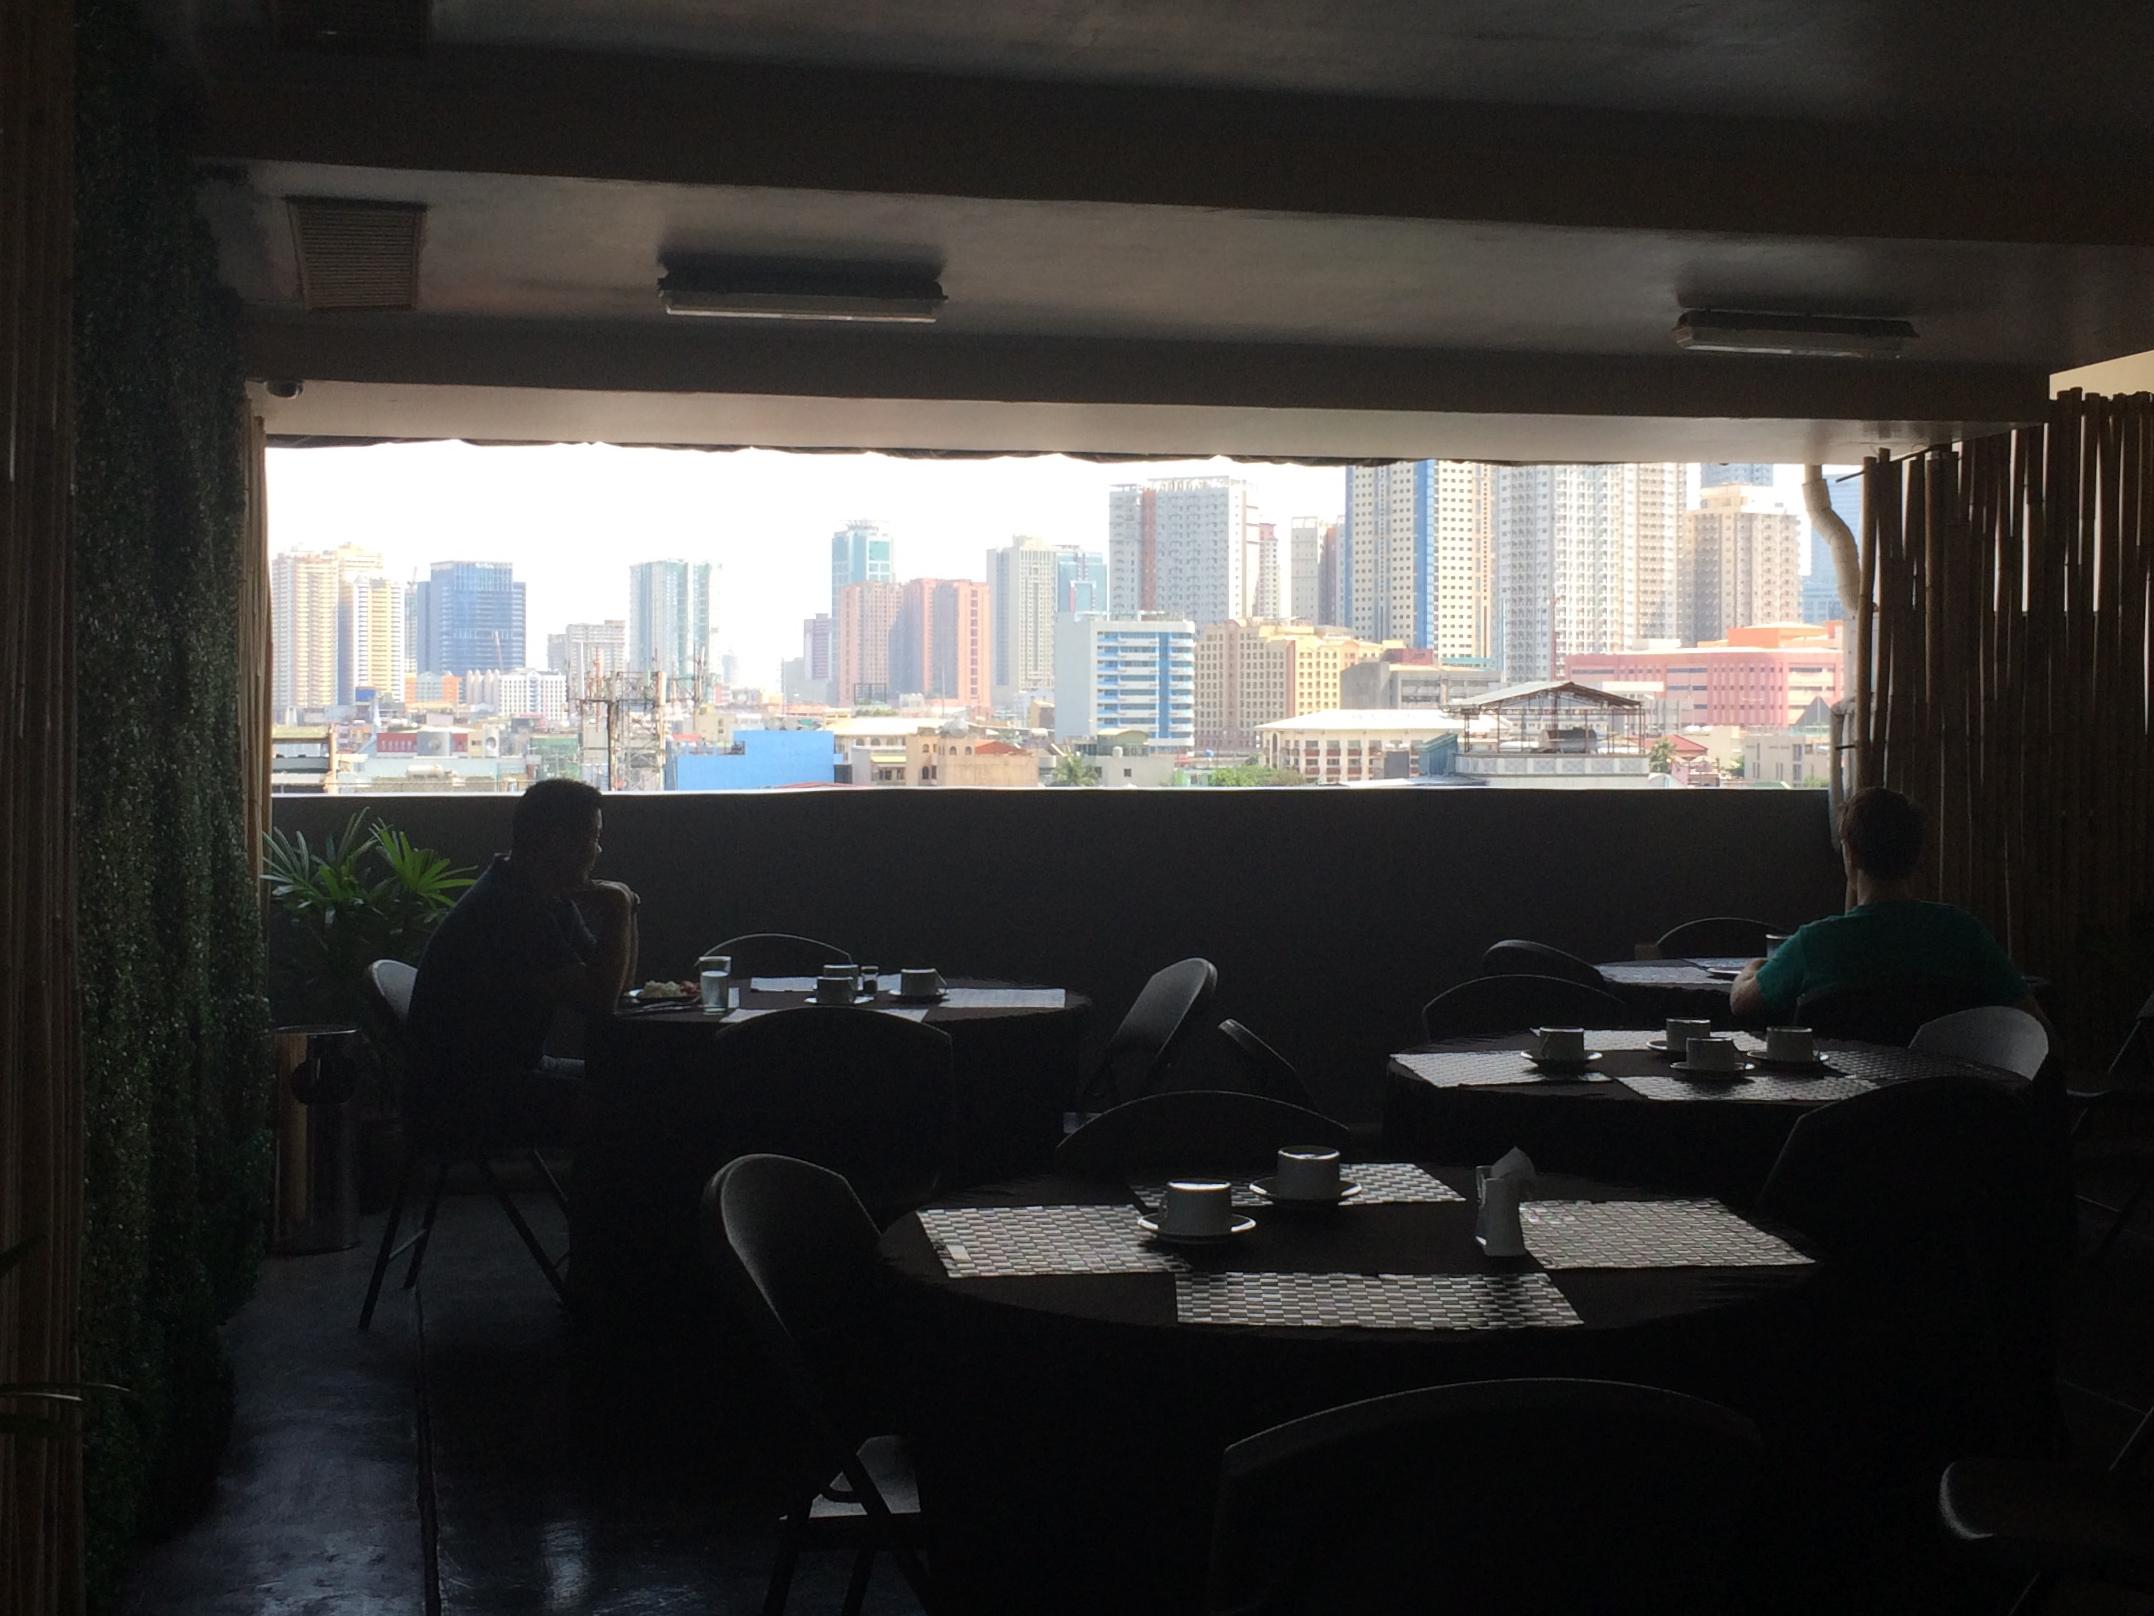 readgerman: Manila skyline